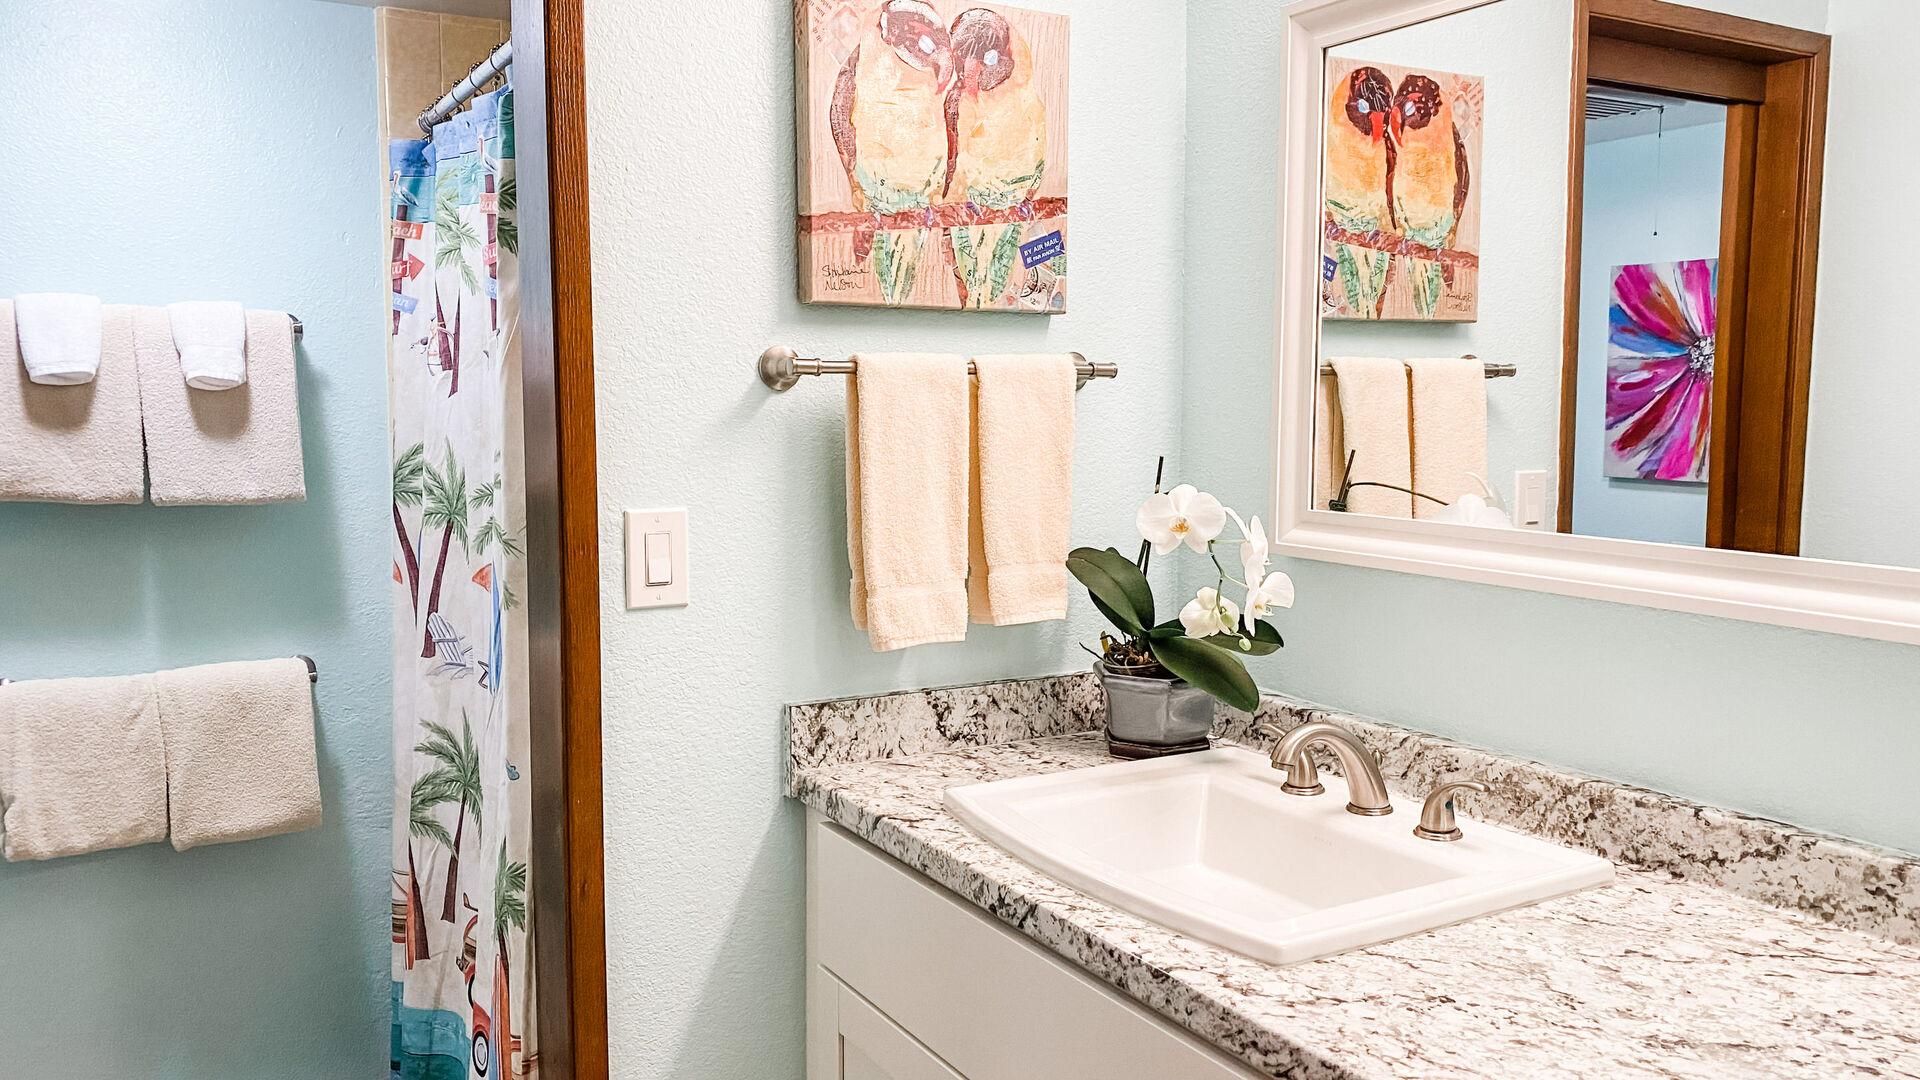 B111 Bathroom and Shower